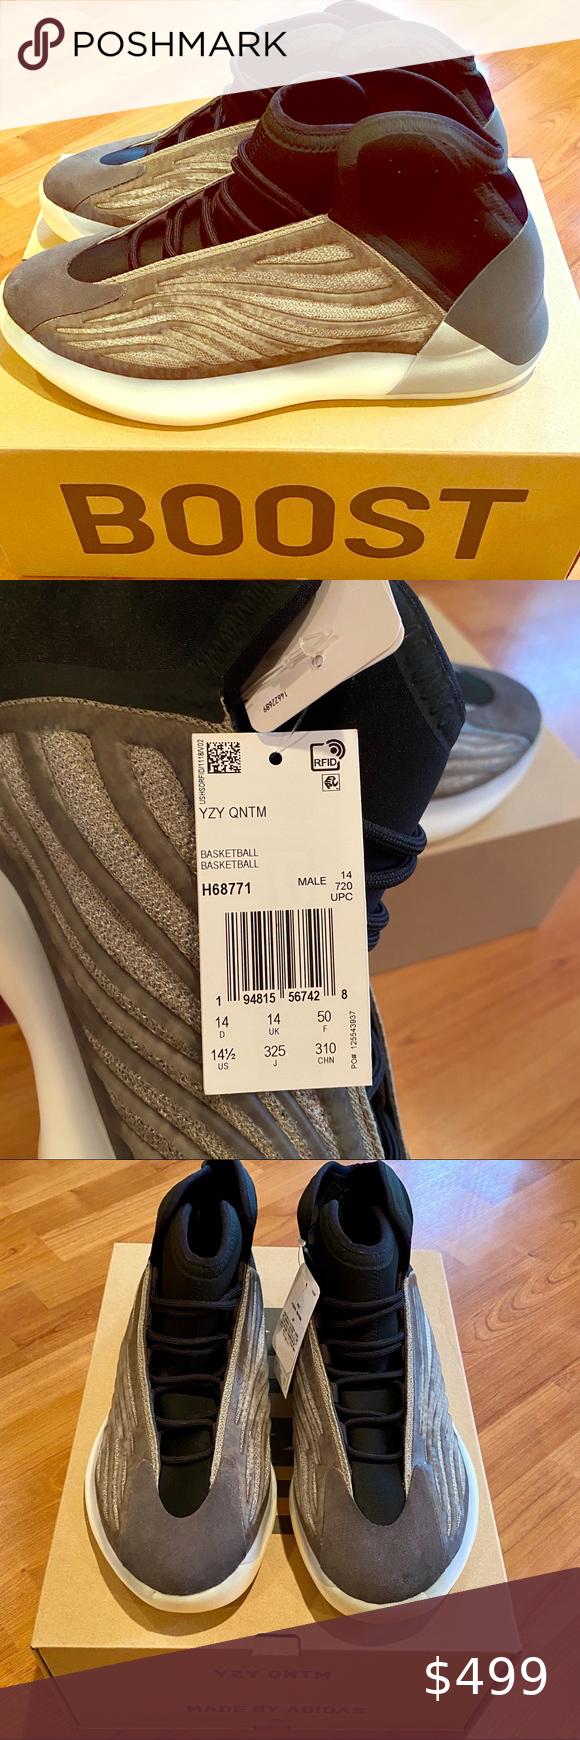 Bnib Size 14 1 2 Yeezy Quantum Barium Basketball In 2020 Yeezy Mens Yeezy Yeezy Shoes